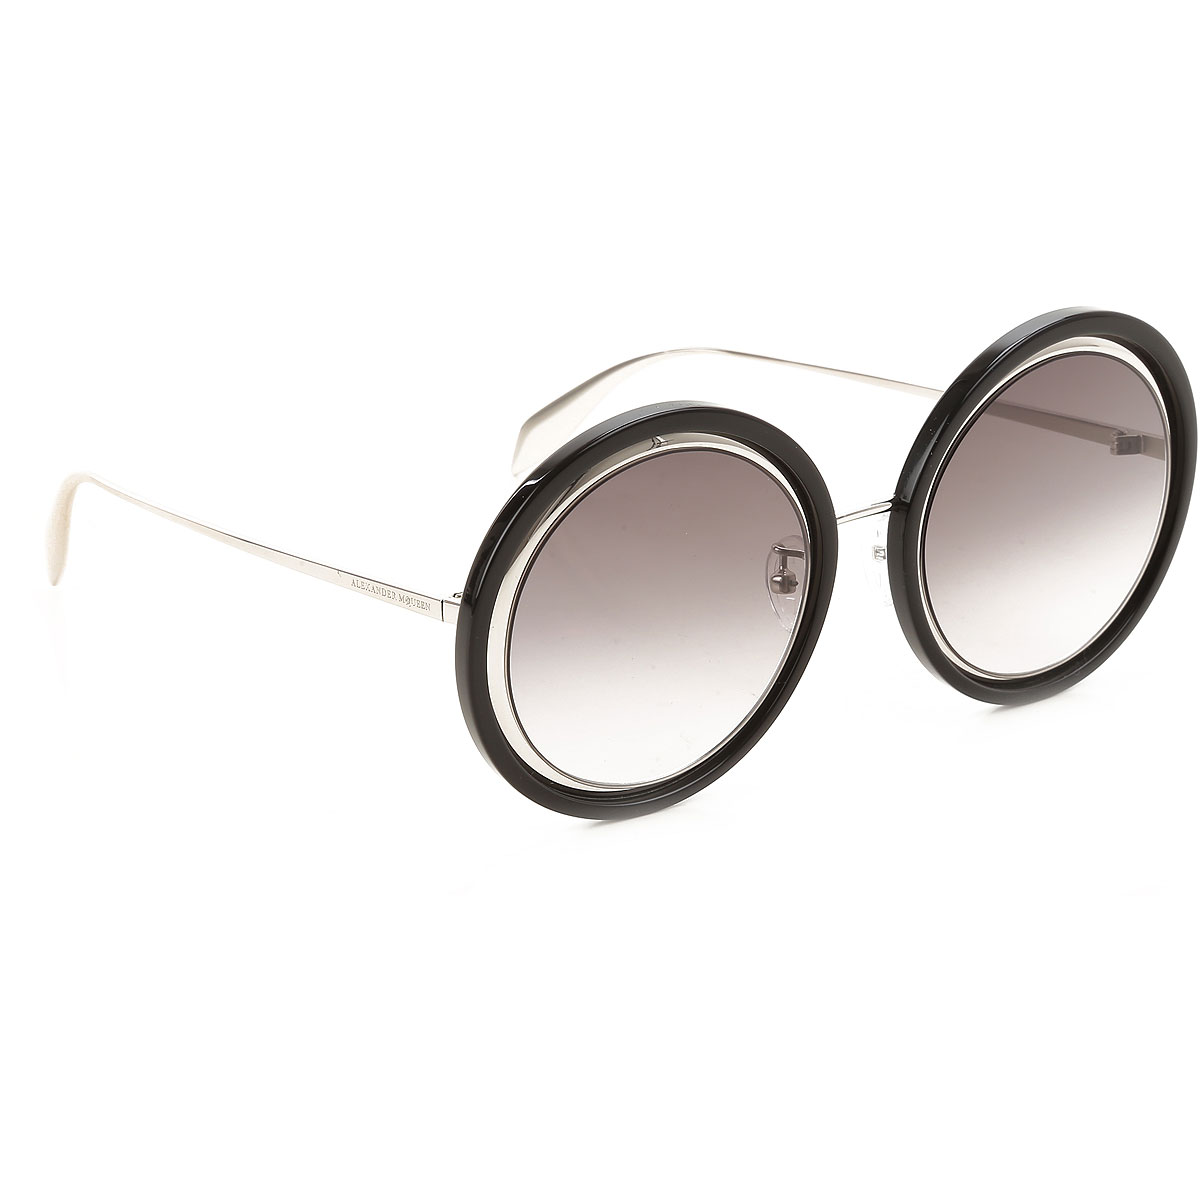 Alexander McQueen Sunglasses On Sale, Black, 2019